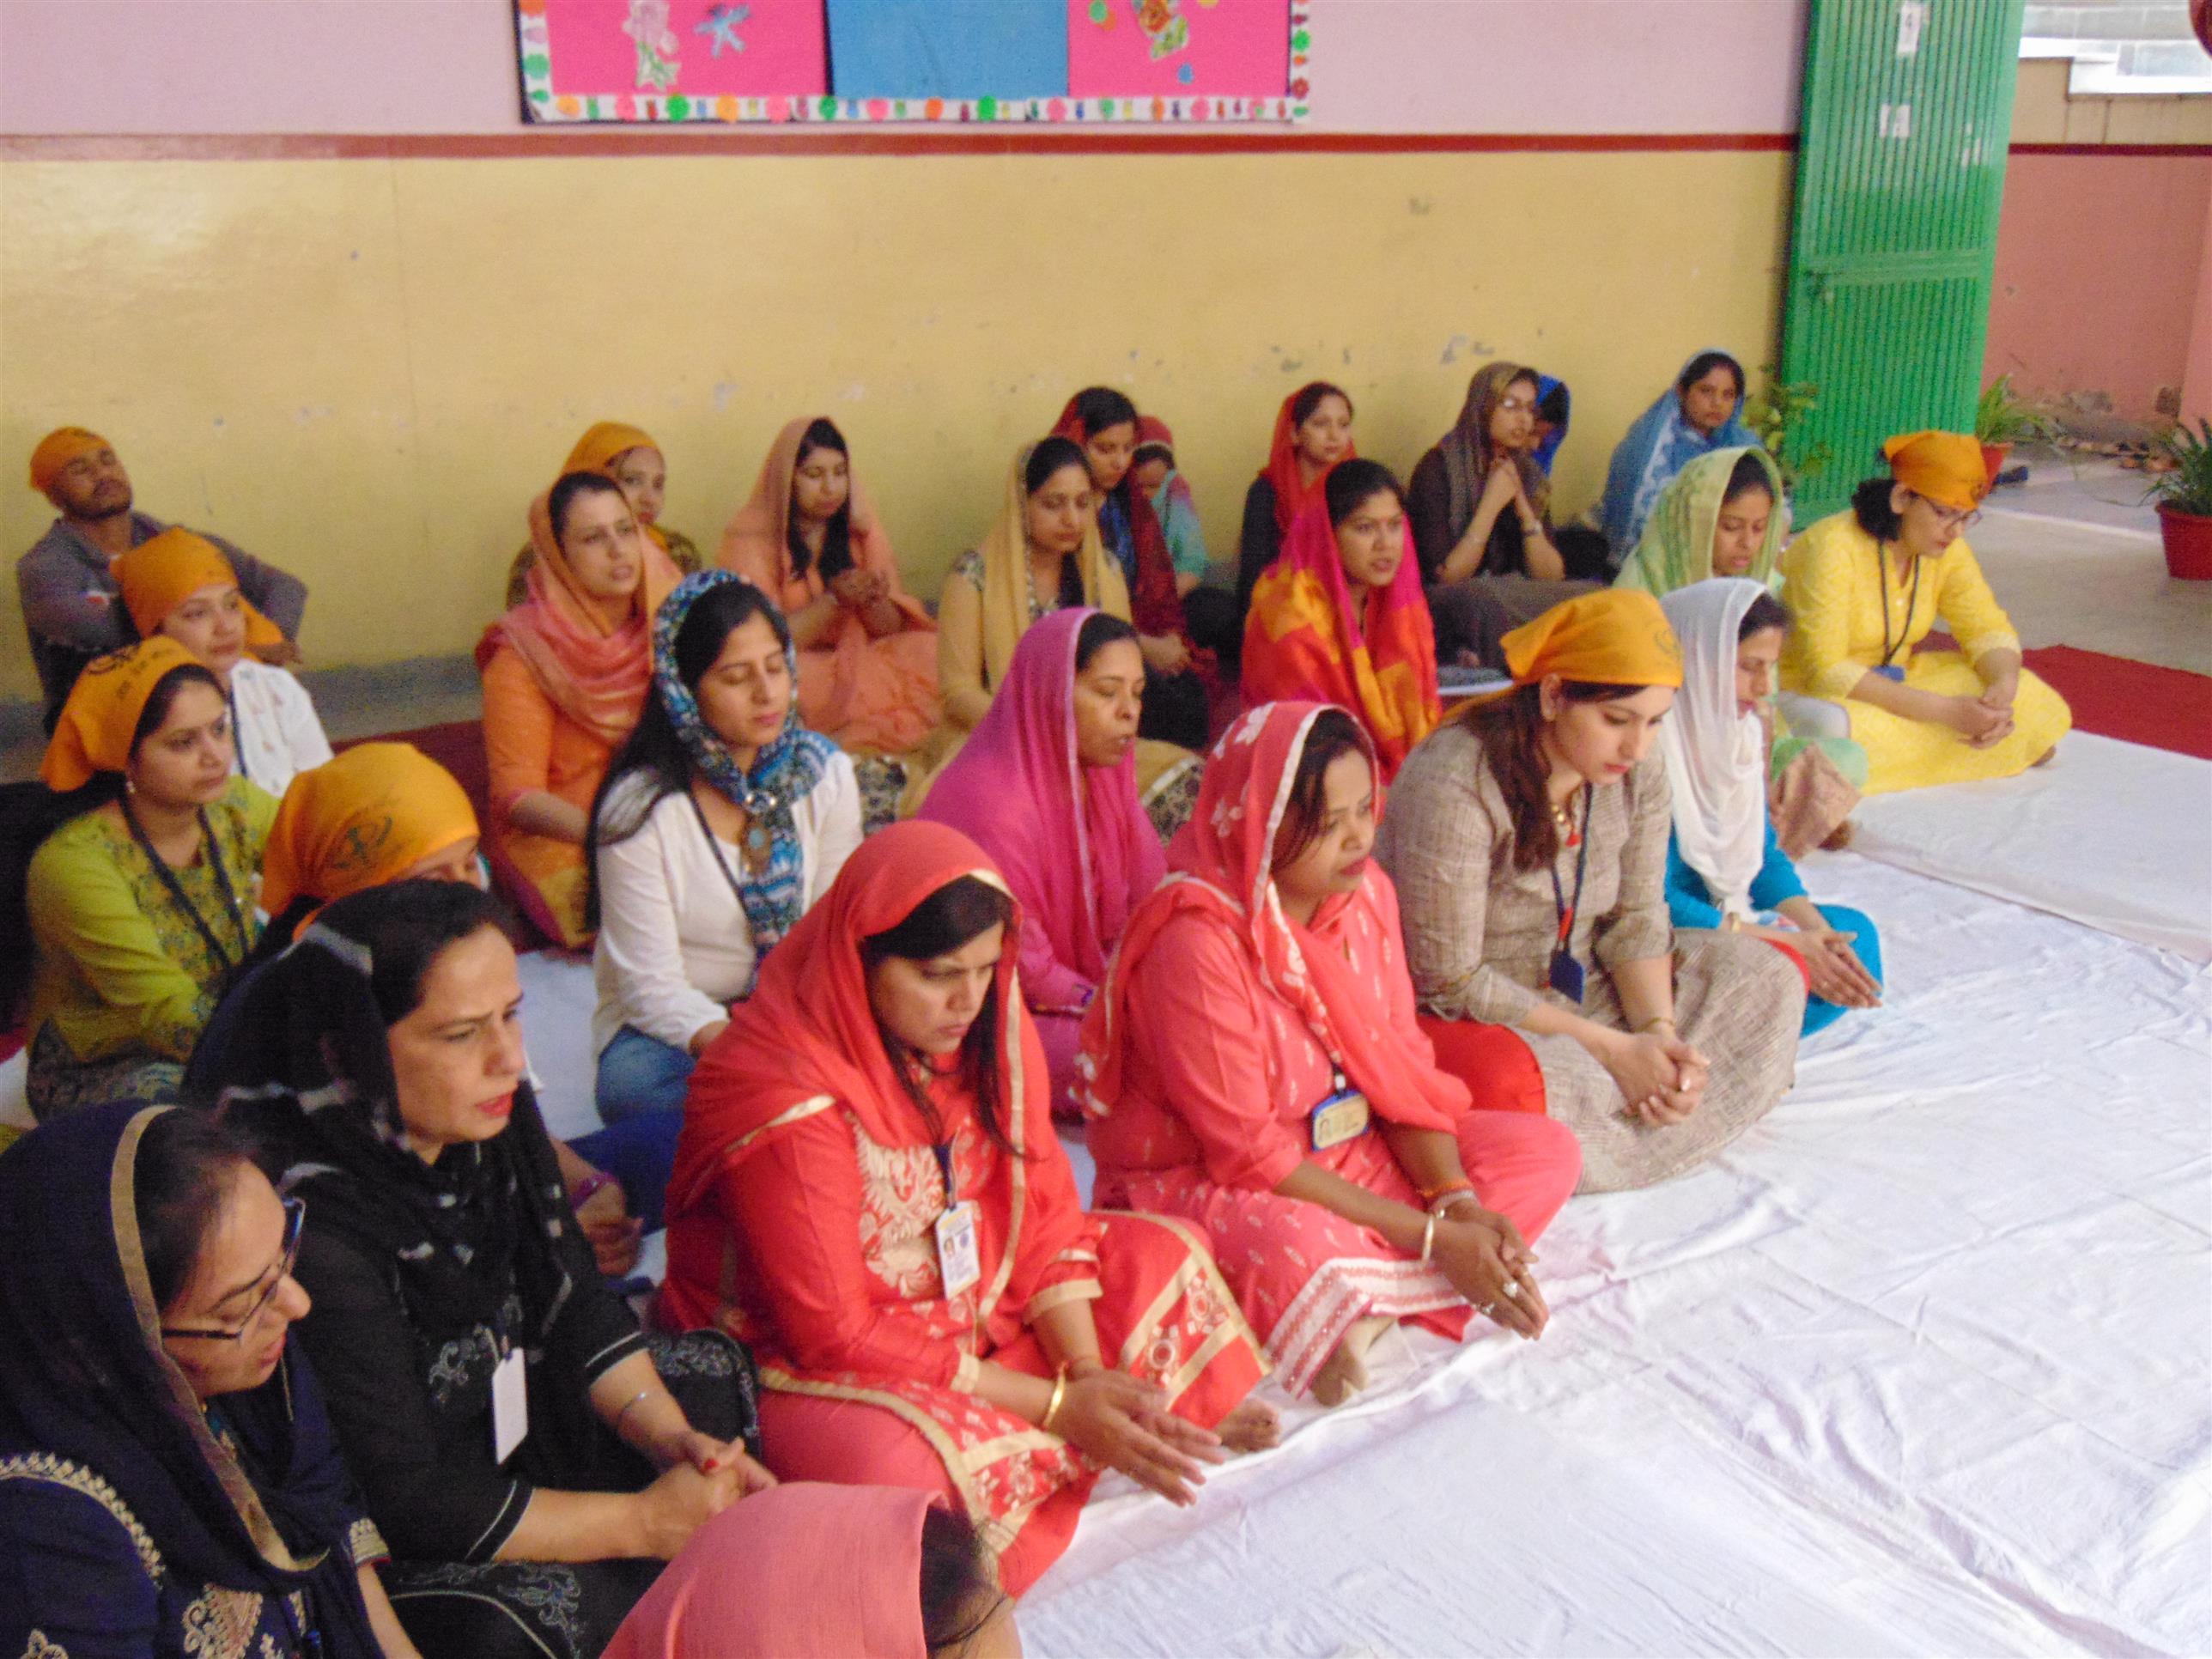 Sukhmani Sahib path | AKSIPS 65 Chandigarh